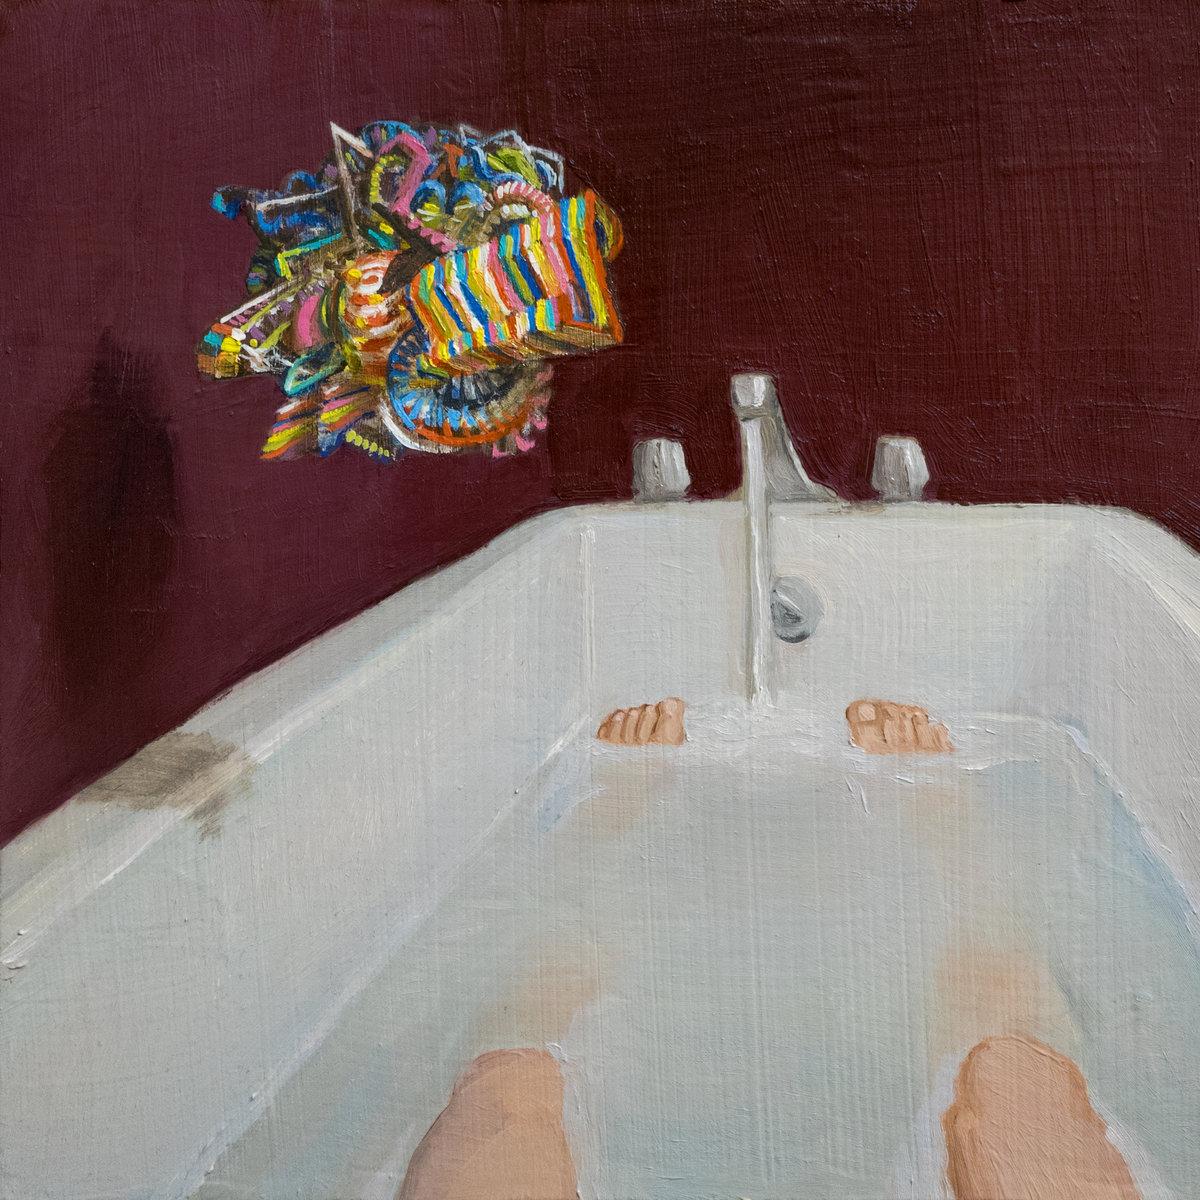 Corder/Harris/Namay/Weeks -  Fractal Selves  (2019) Amalgam